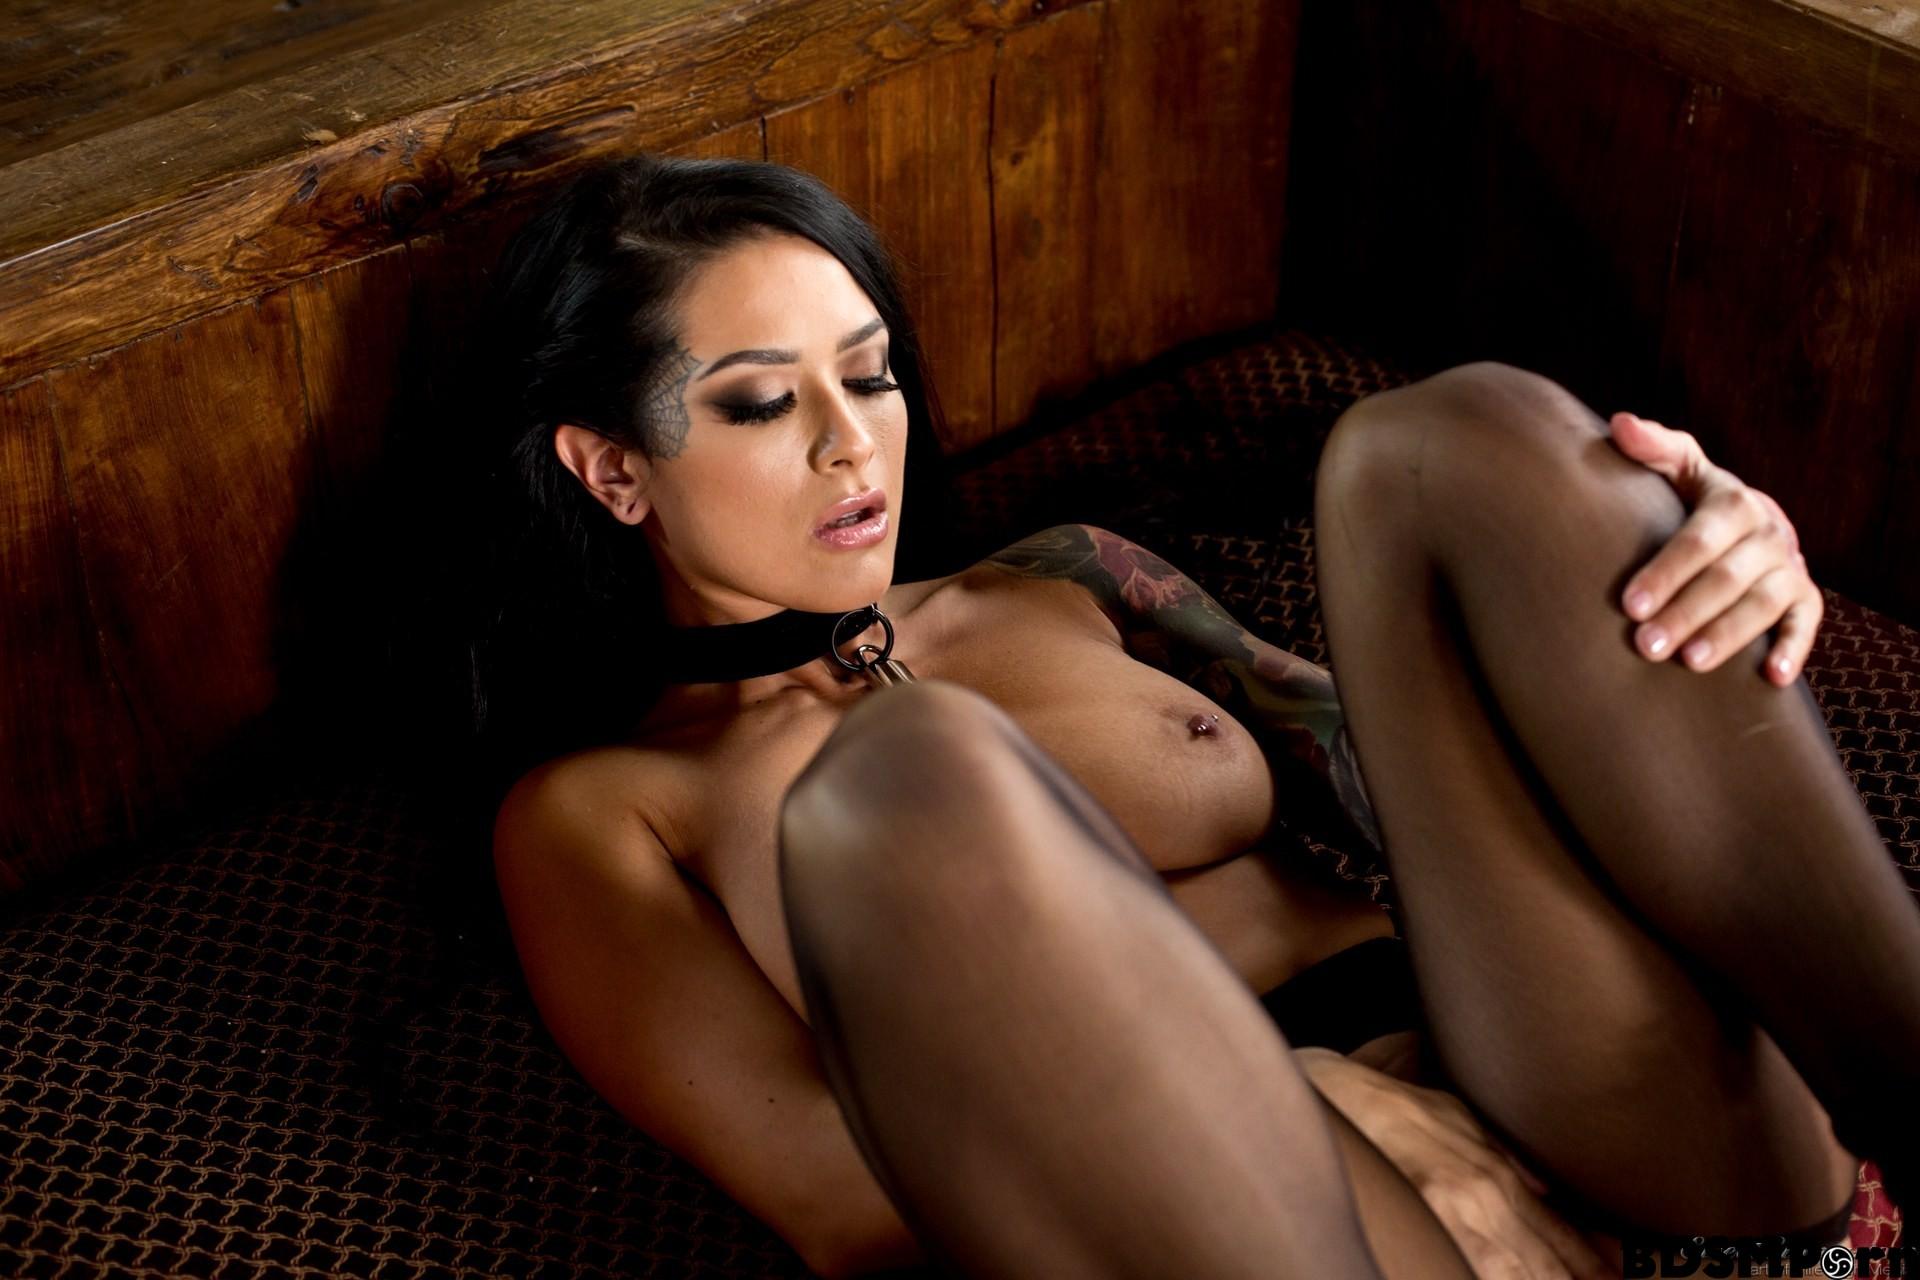 Women mature nude full figured